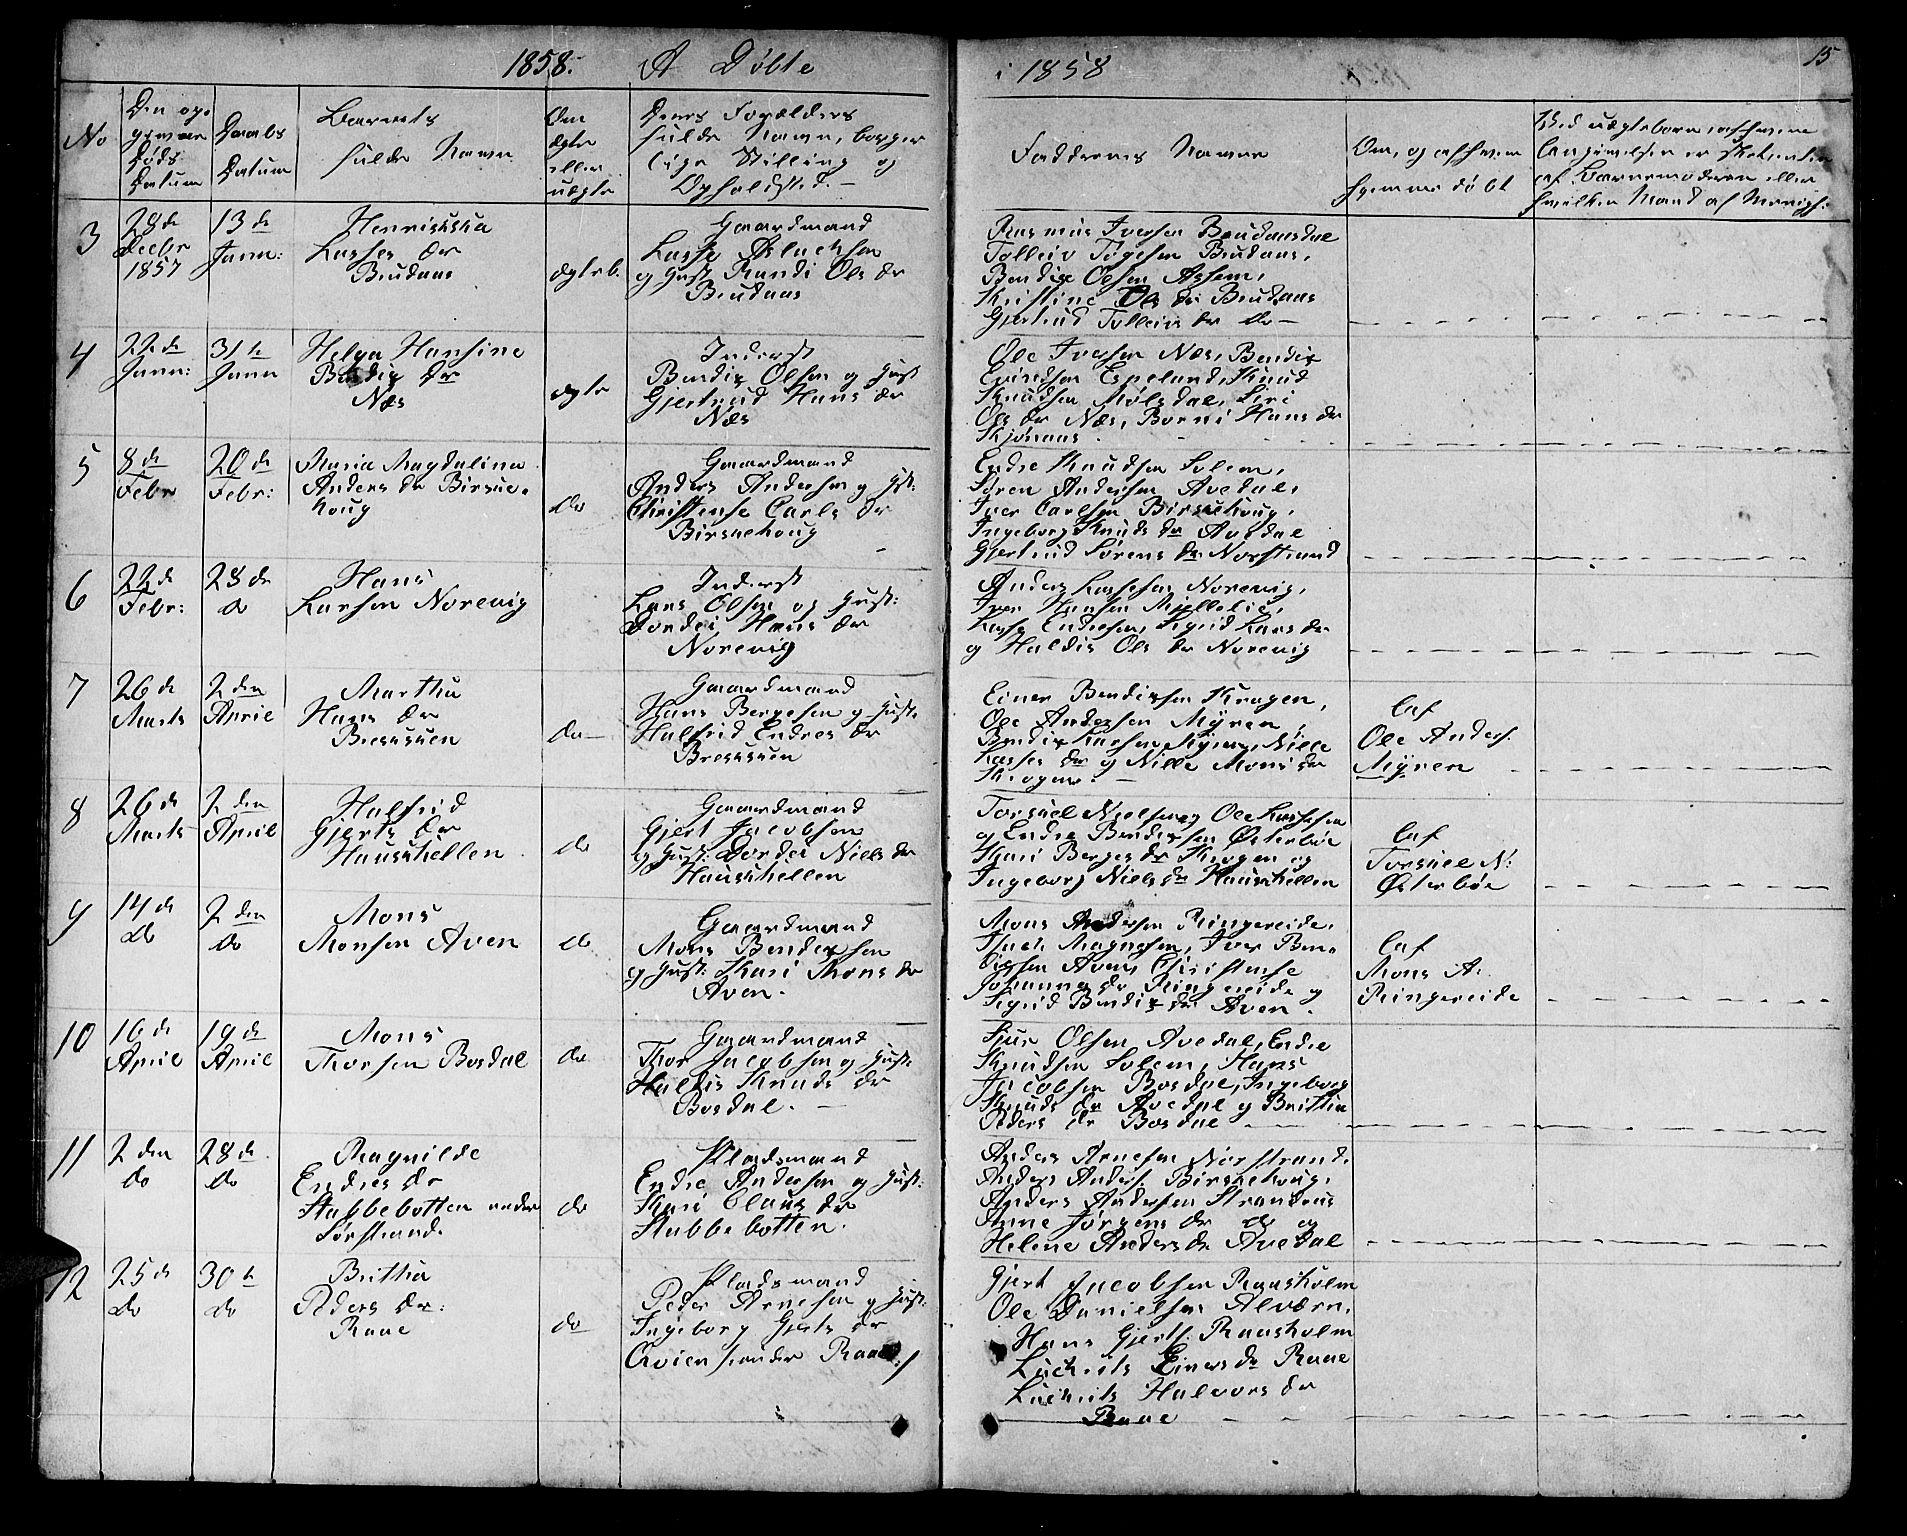 SAB, Lavik sokneprestembete, Klokkerbok nr. A 1, 1854-1881, s. 15